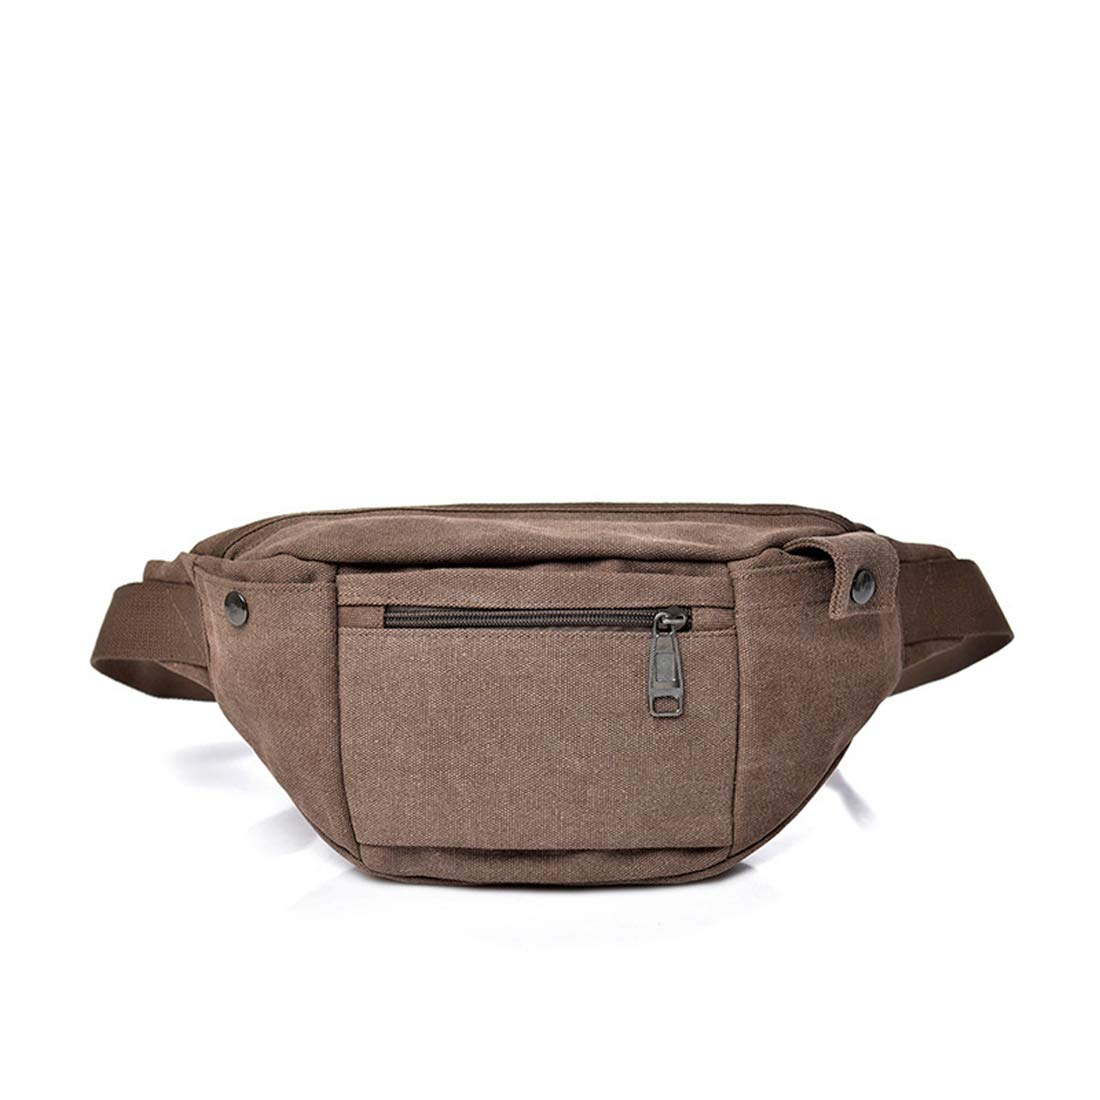 Color : Coffee Color Adams chad Belt Holster Bag Fanny Waist Pack Crossbody Bag for Men Boy